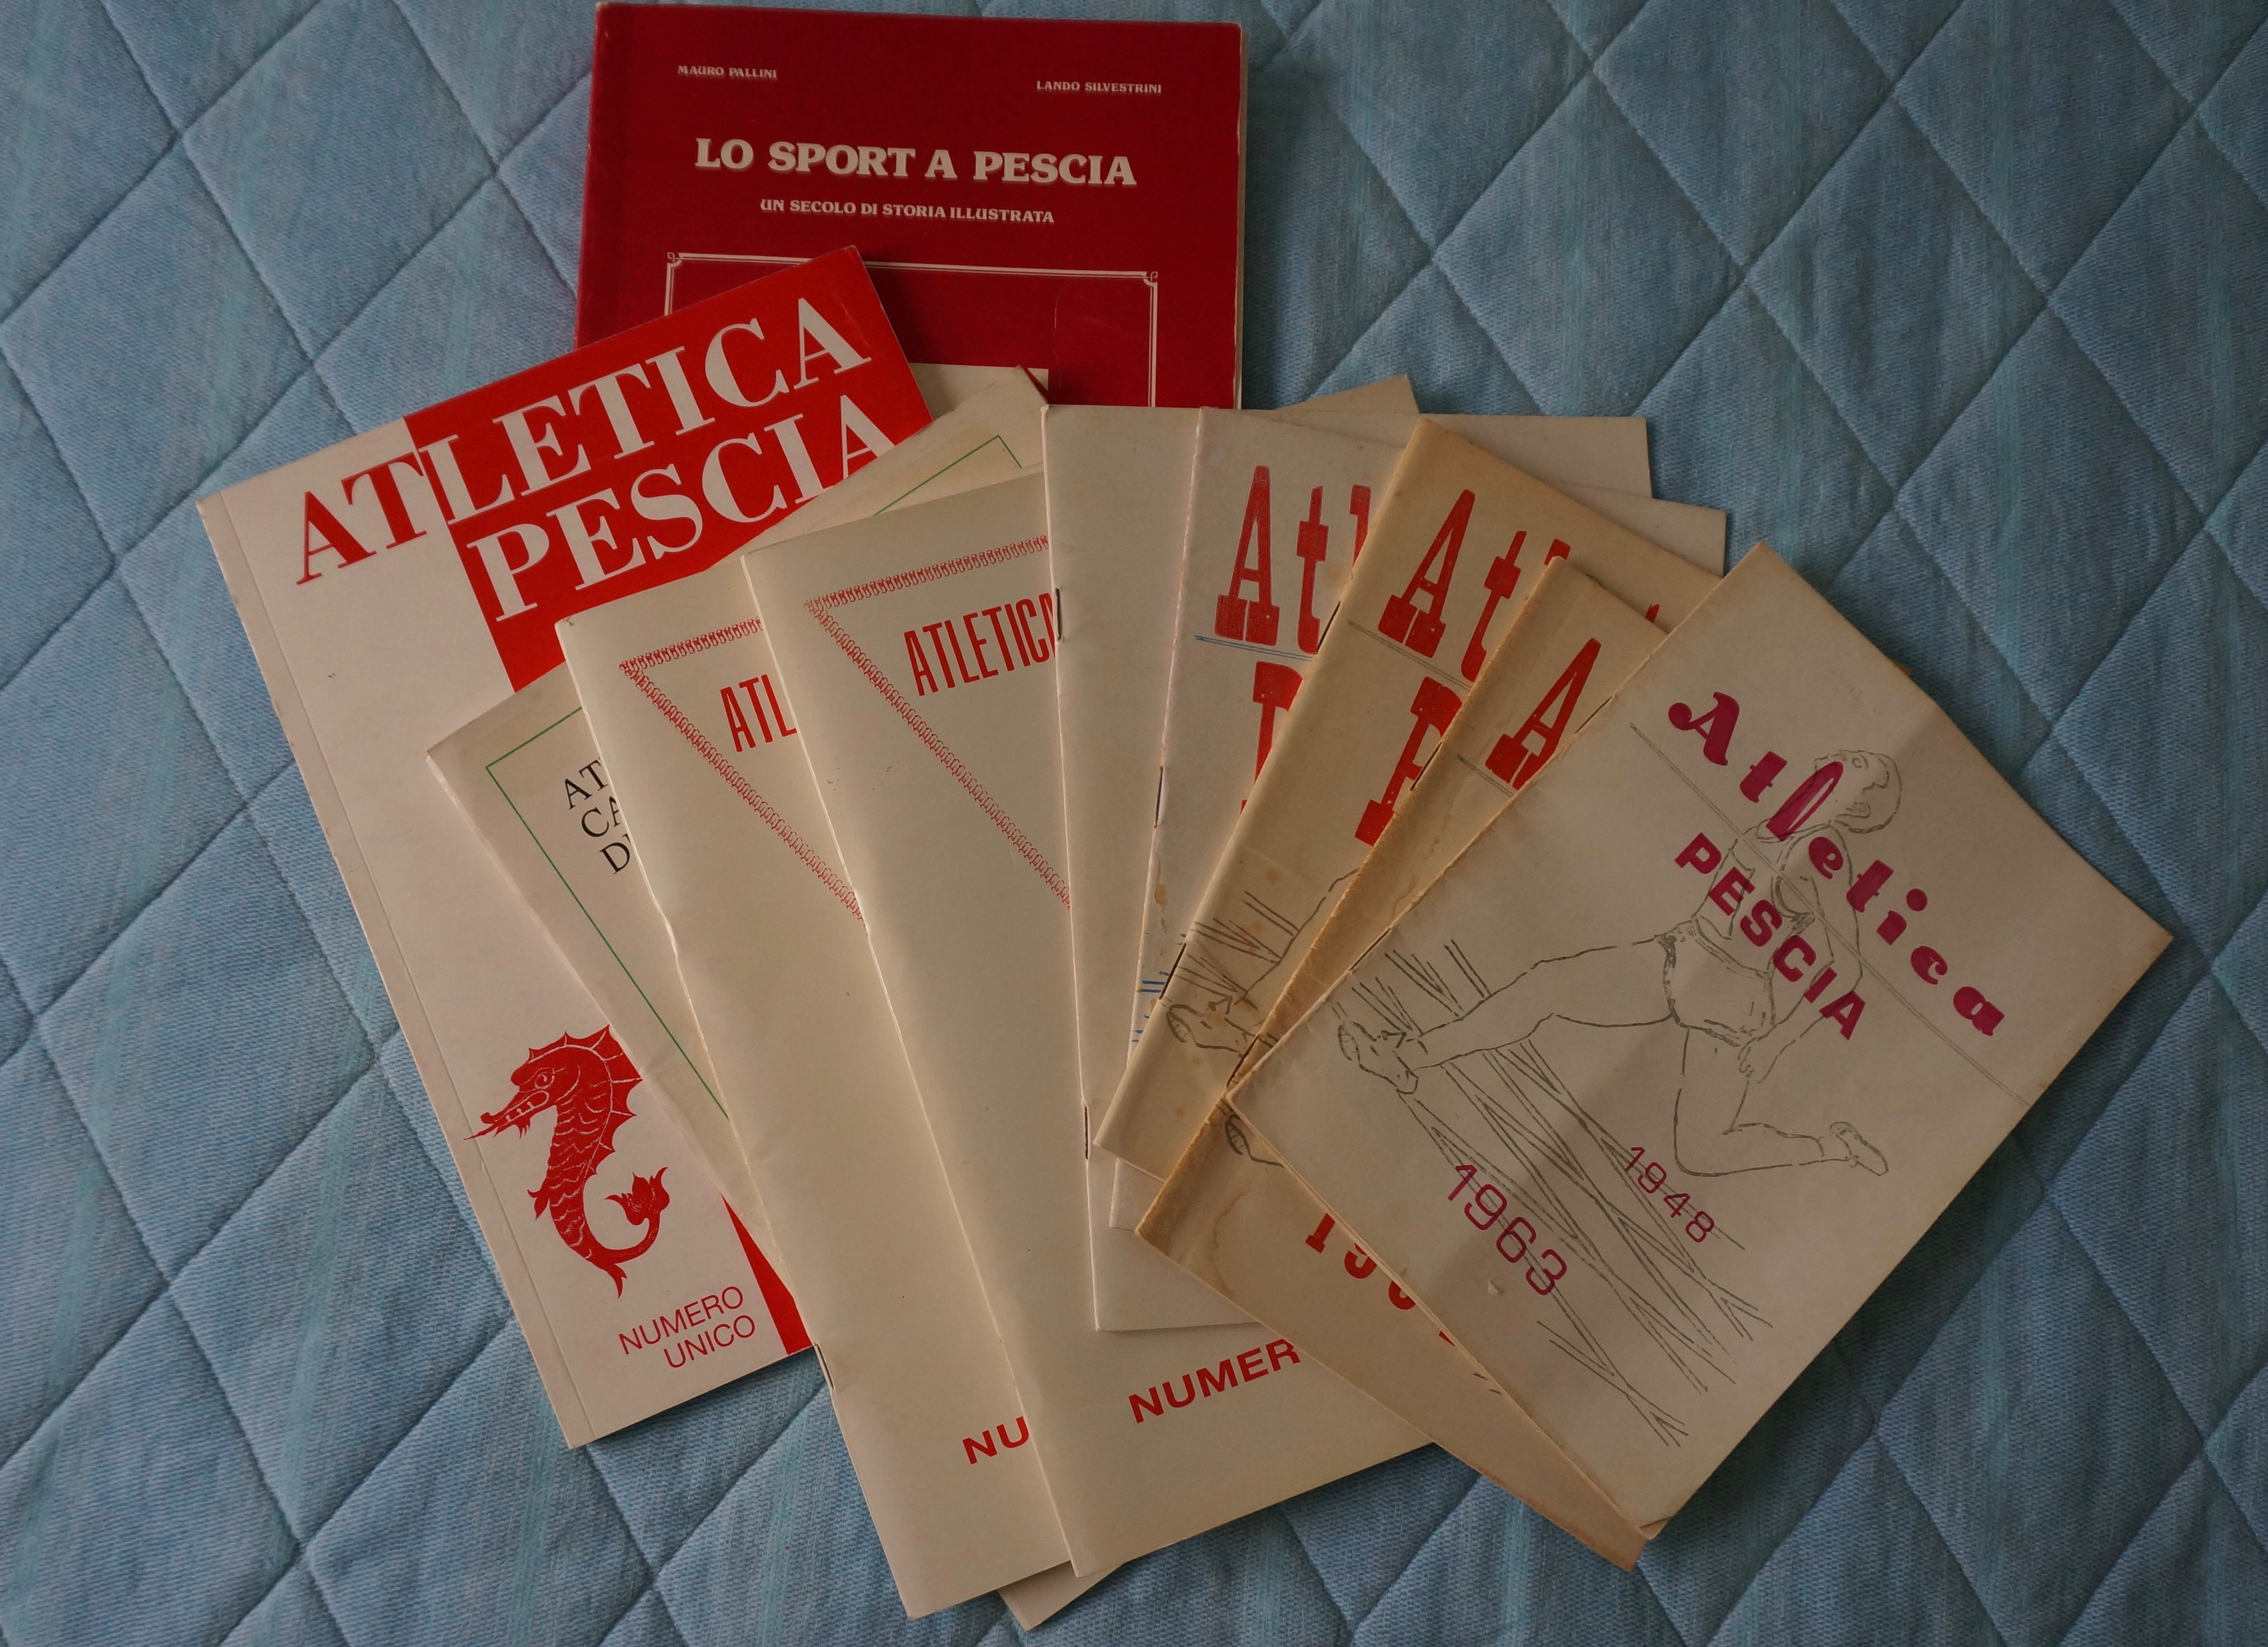 Atletica Pescia 1946 sport numeri unici pescia